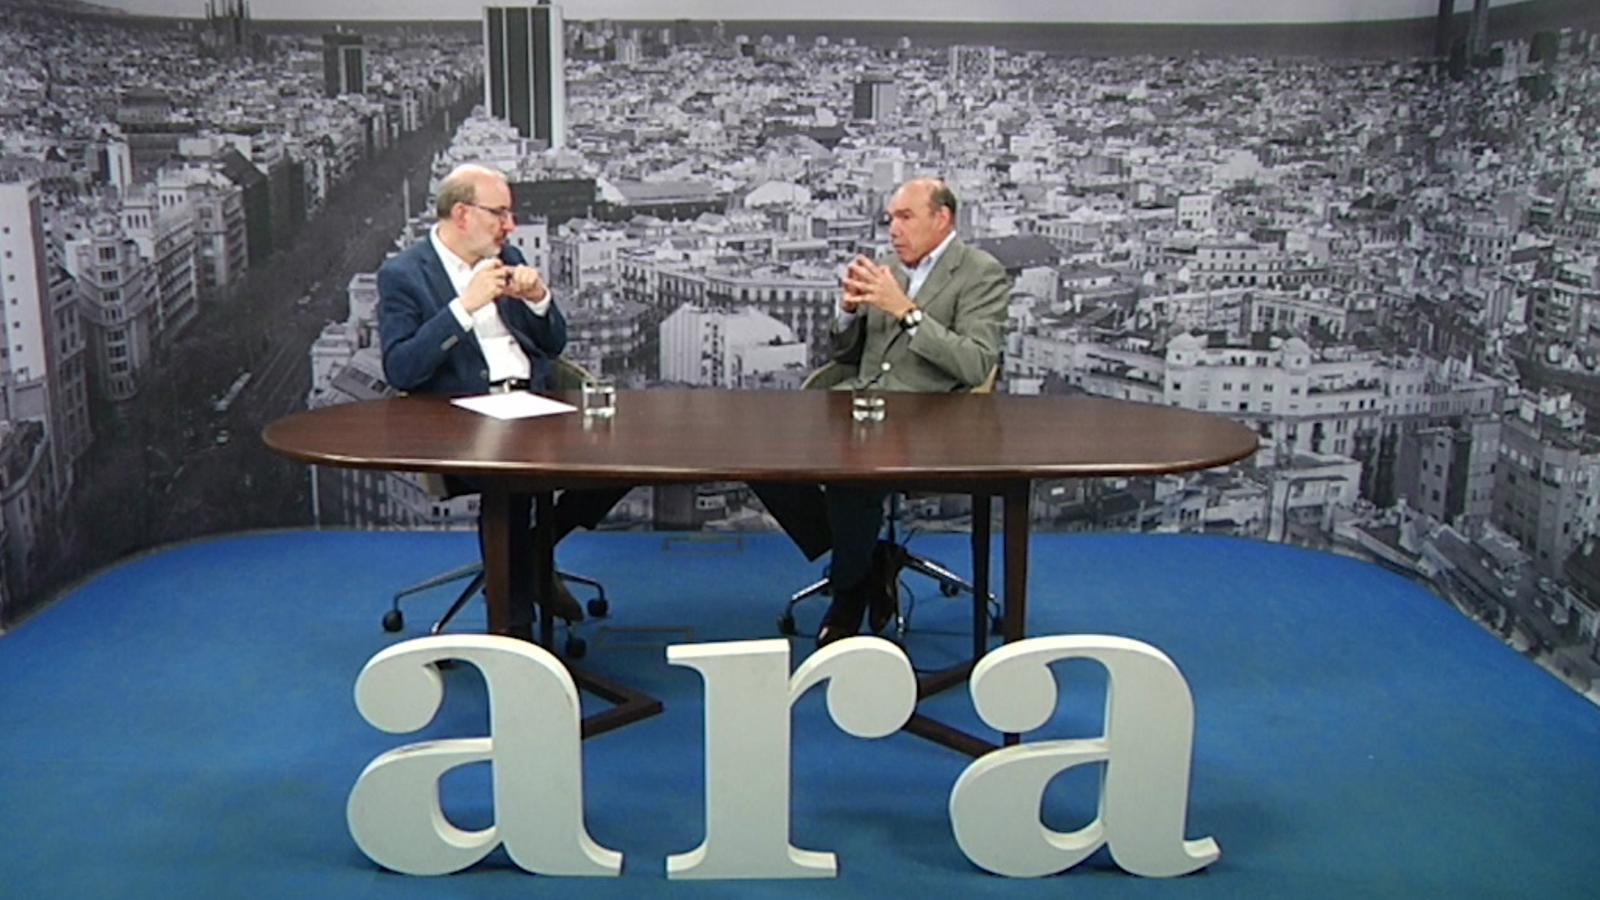 Entrevista d'Antoni Bassas a Antoni Esteve